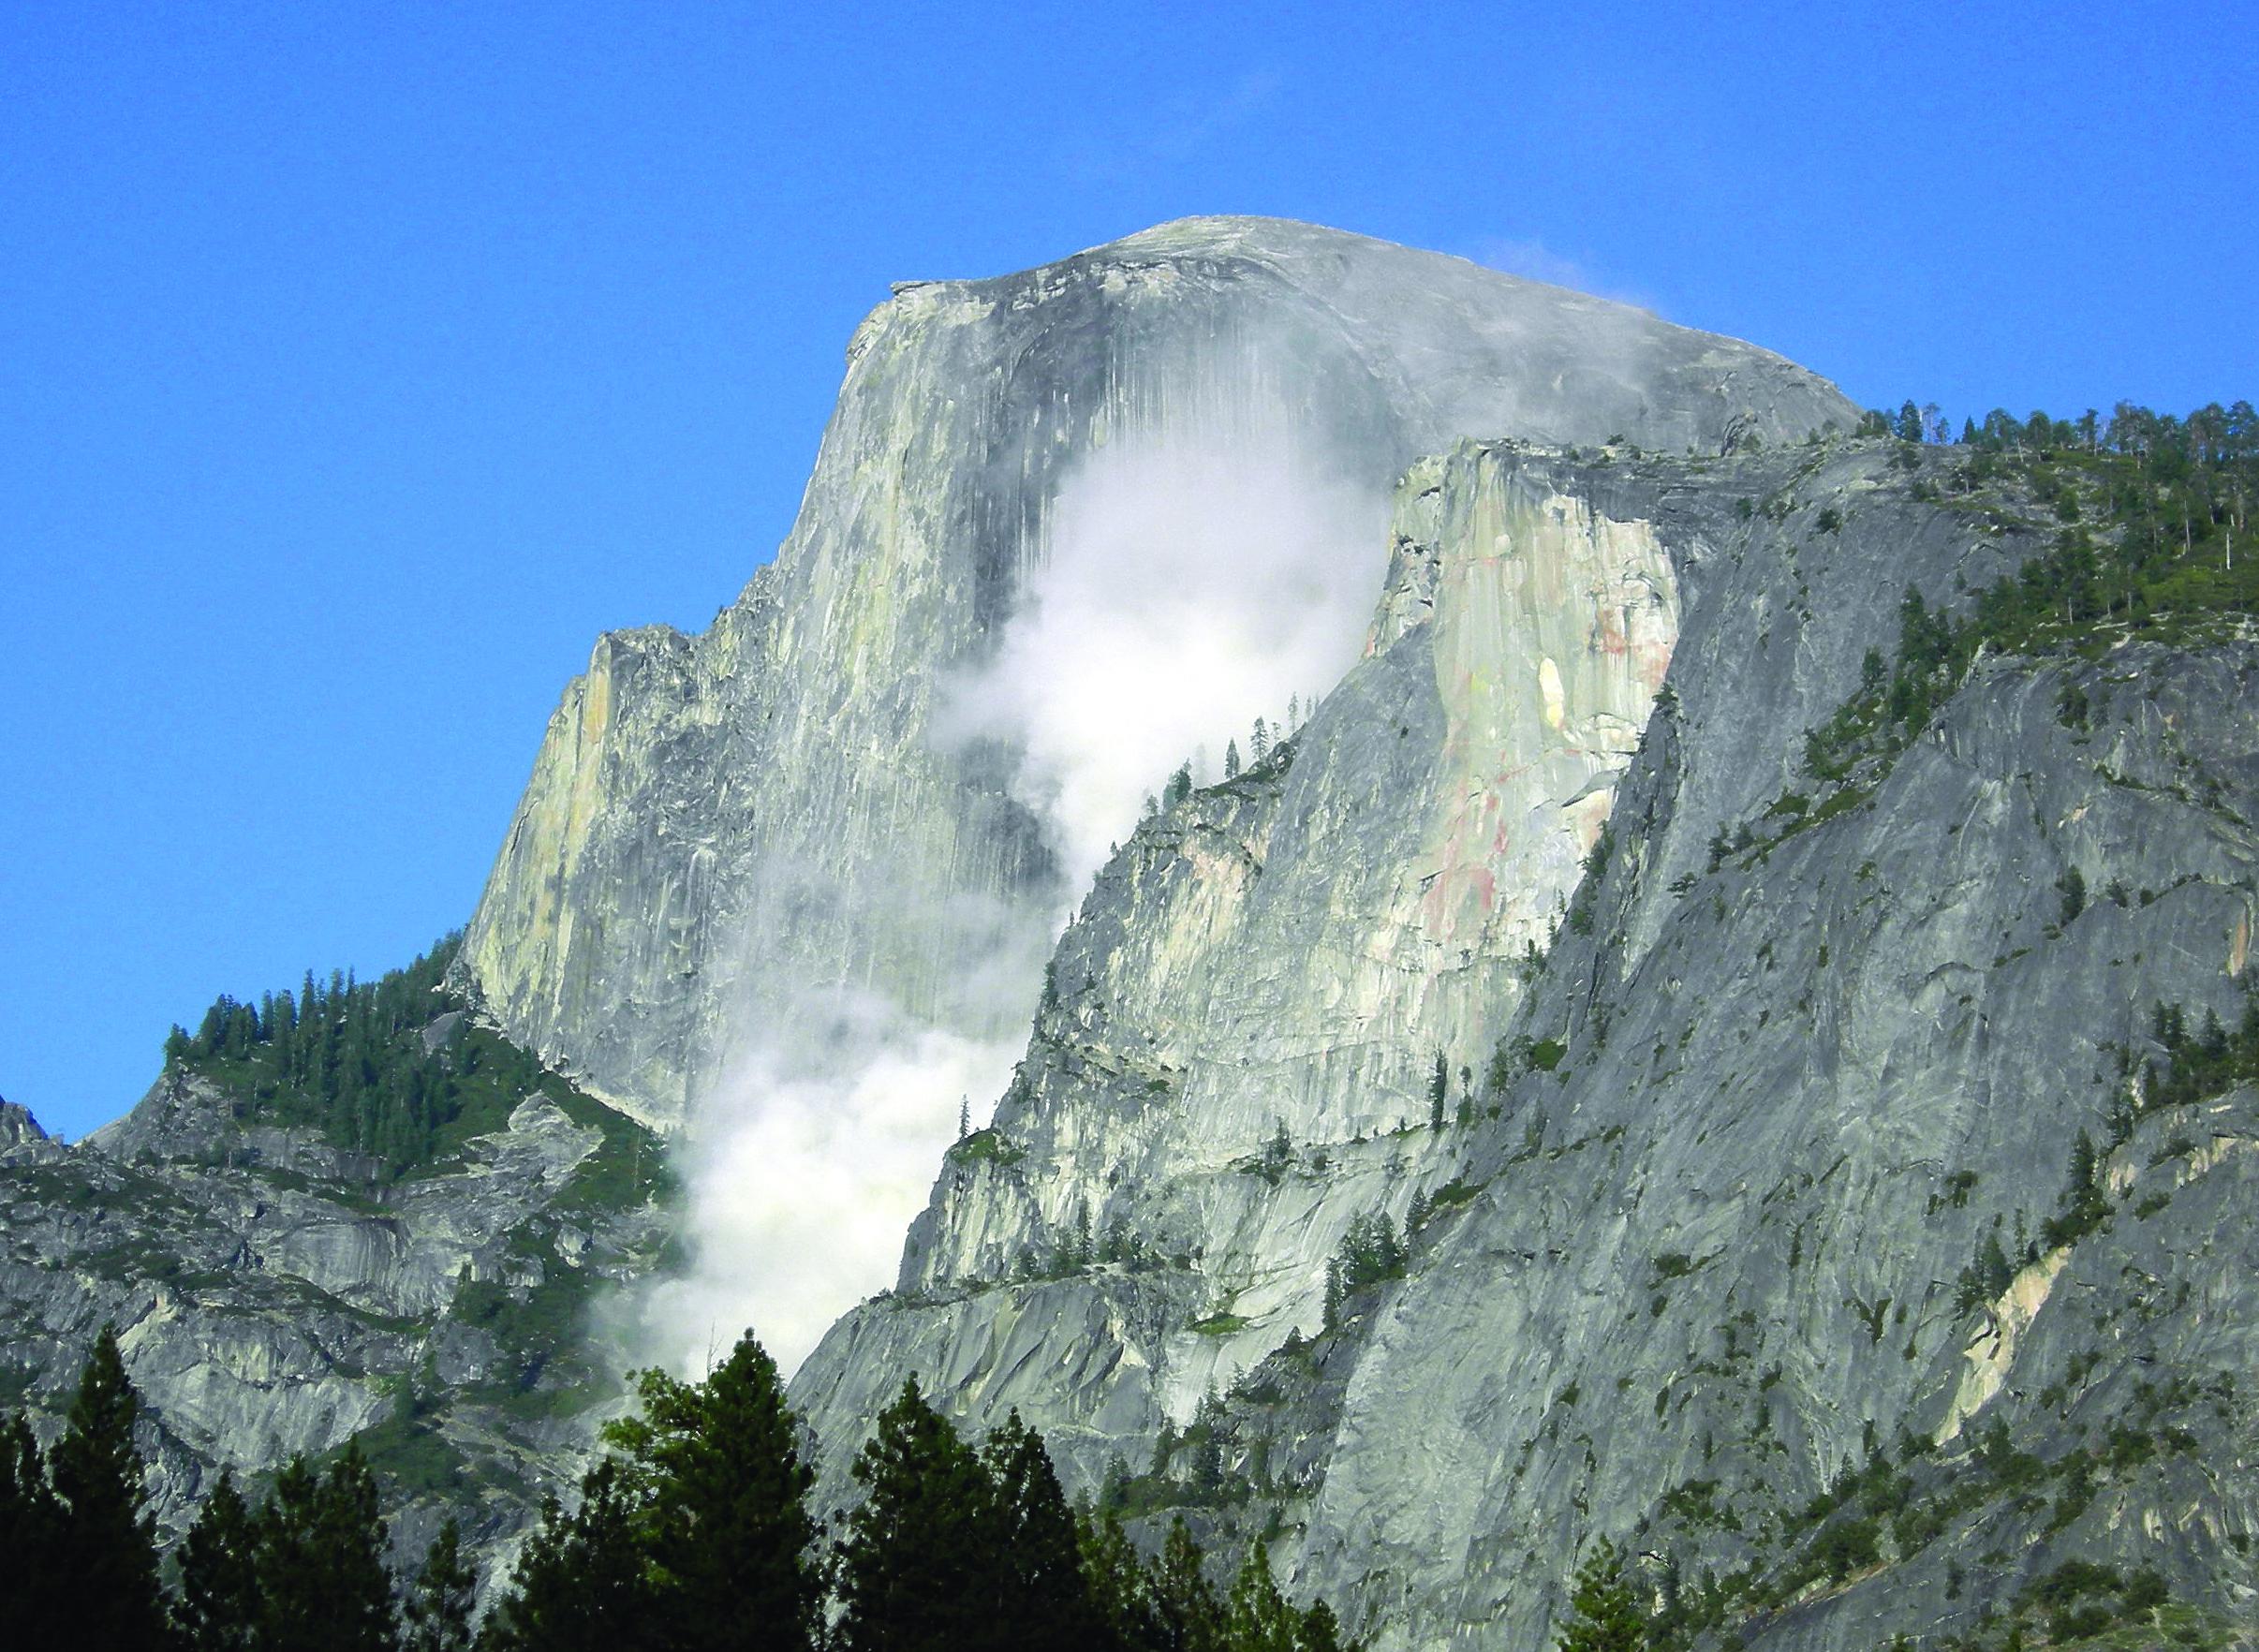 Reducing Rockfall Risk in Yosemite National Park - Eos